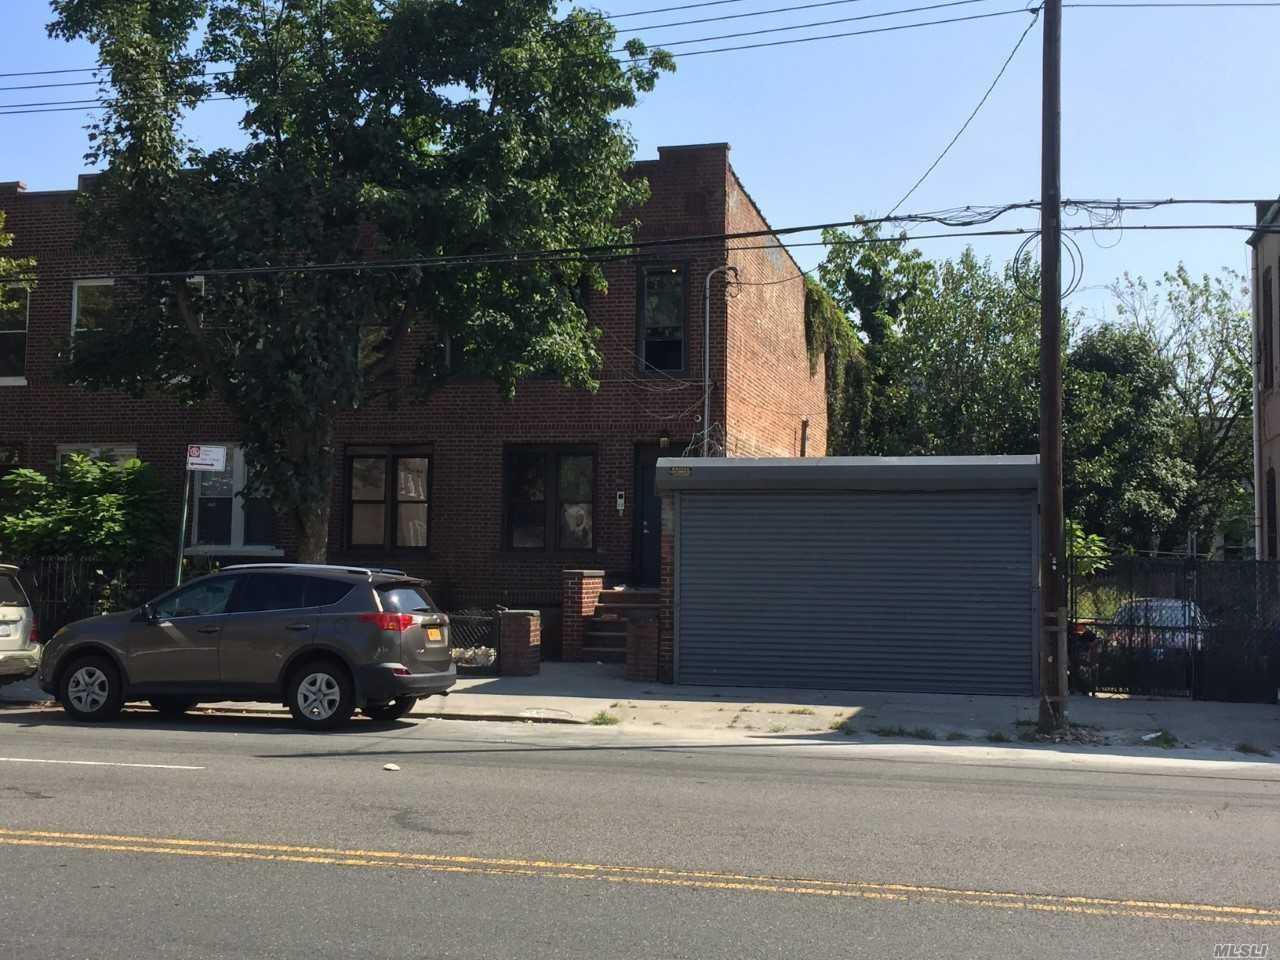 1245 Blake Avenue - Cypress Hills, New York